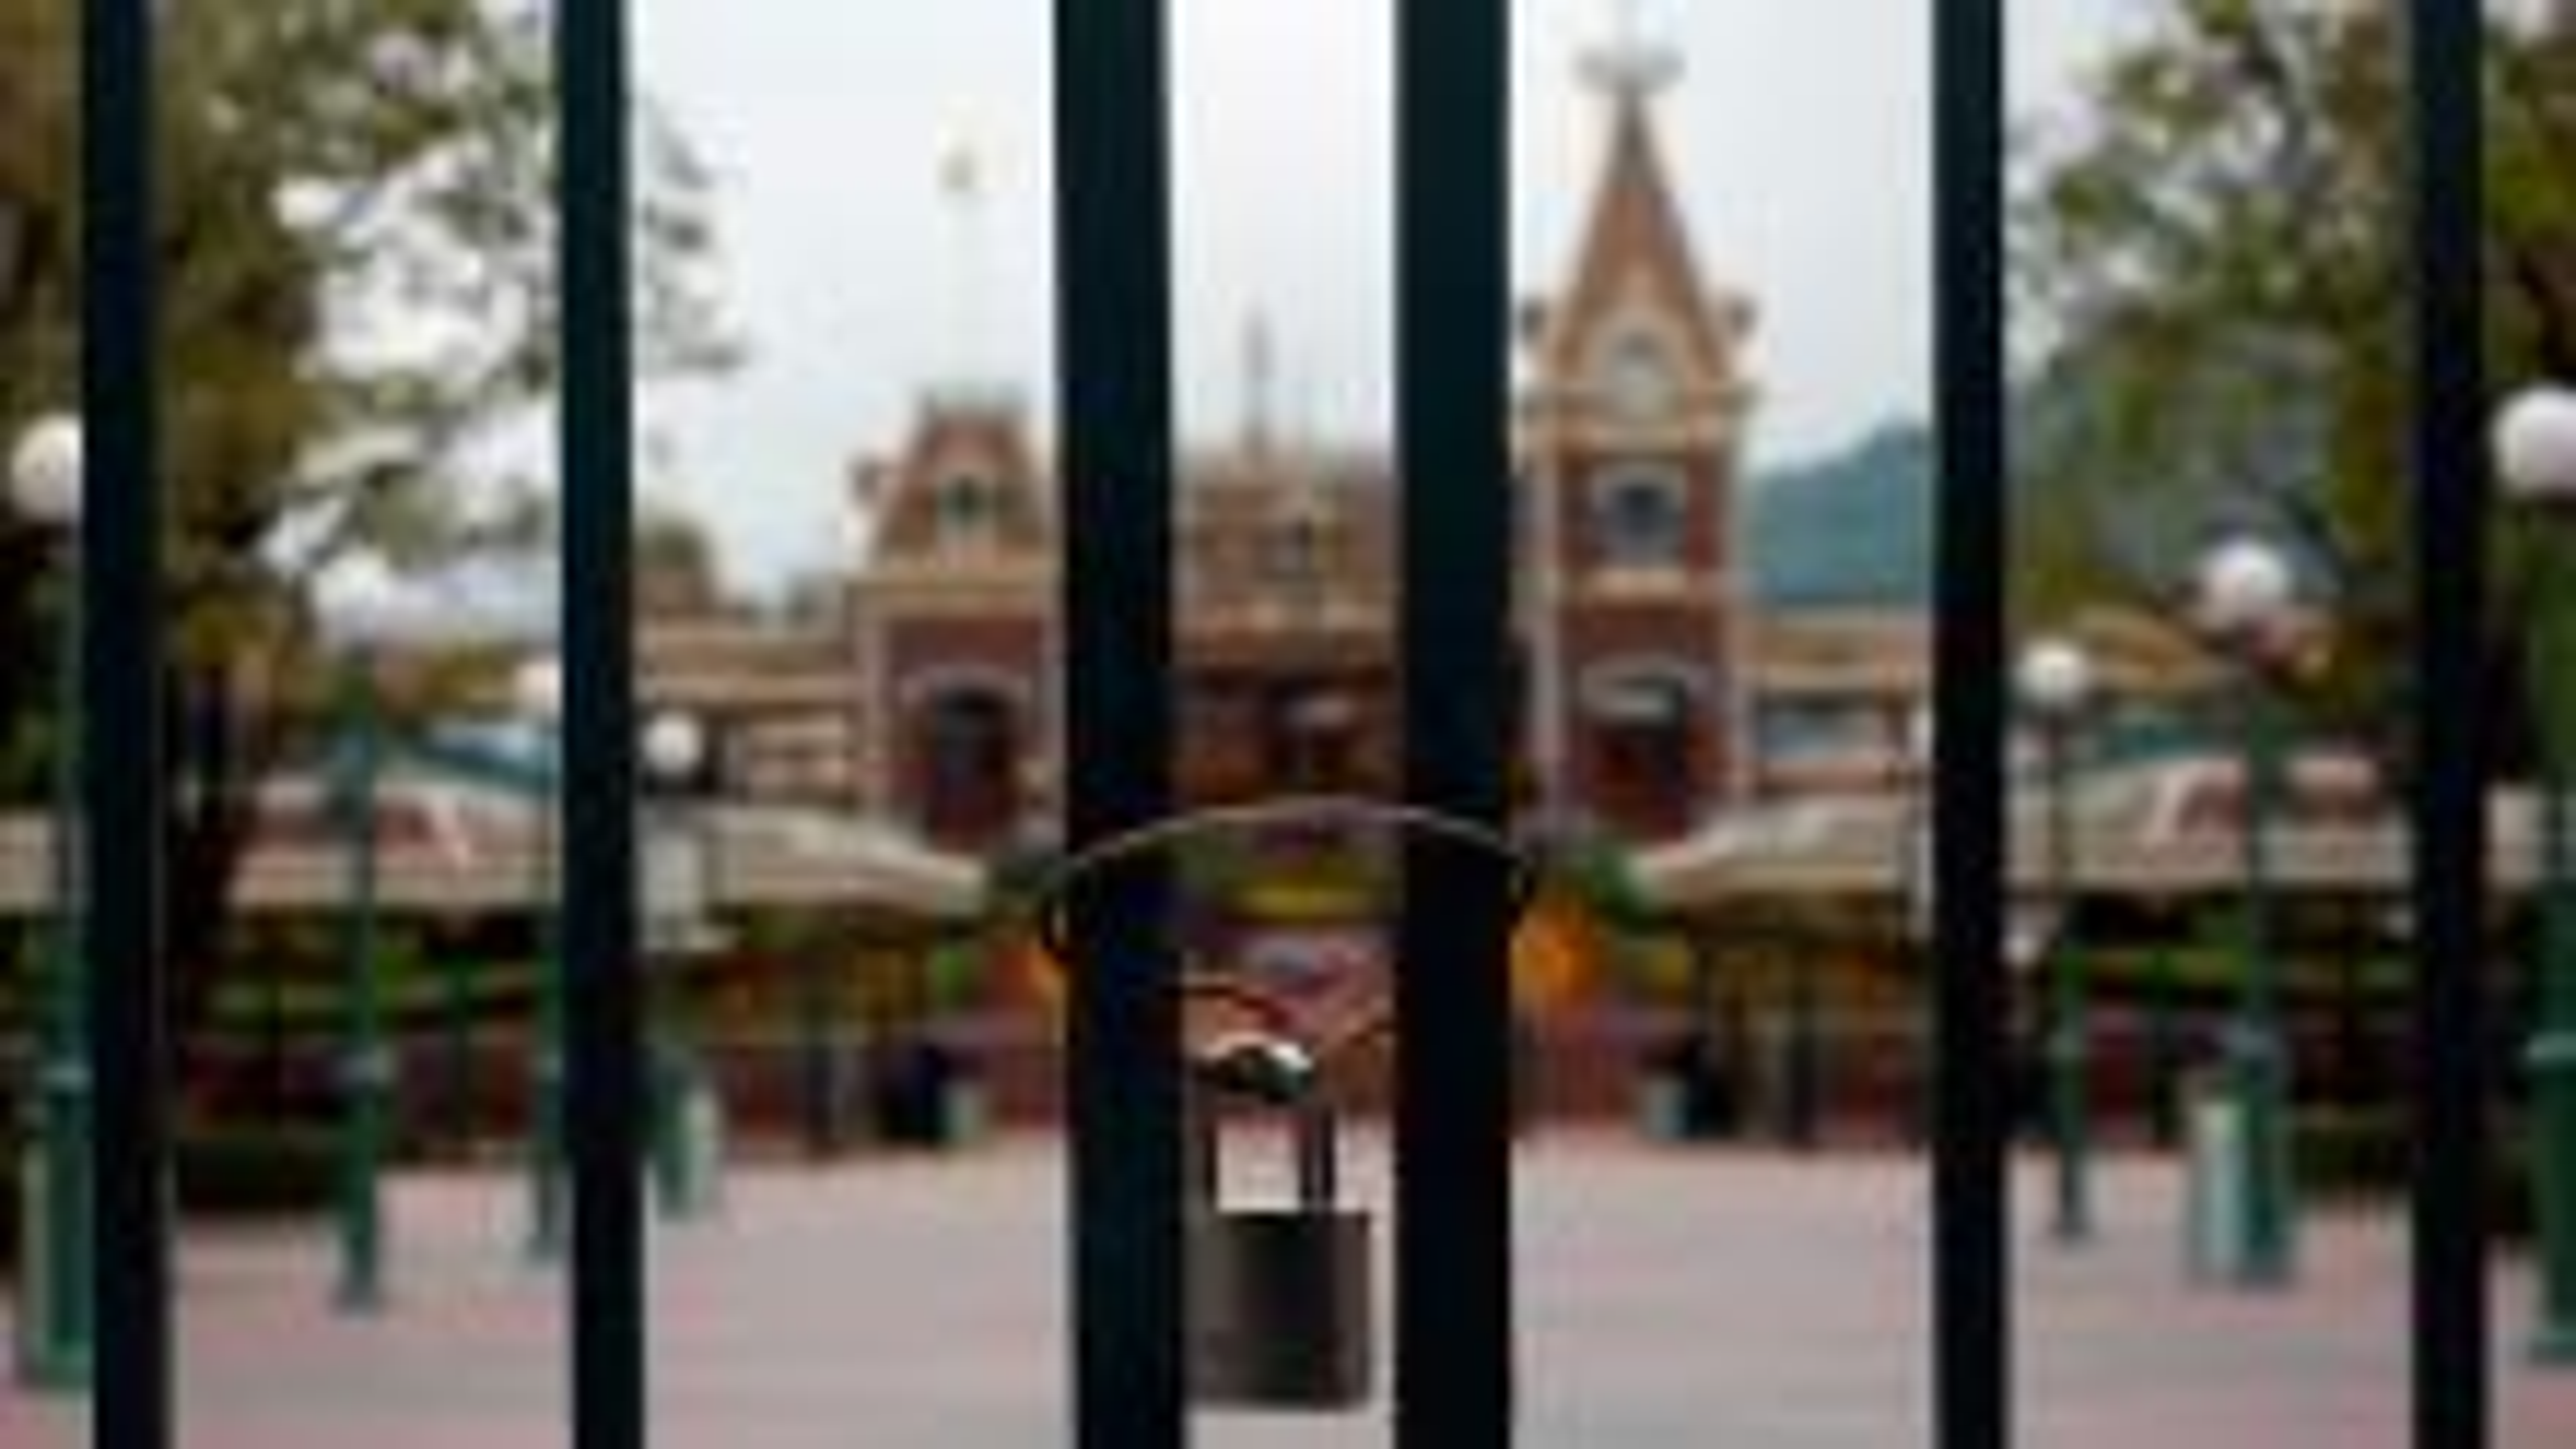 Hong Kong Disneyland is seen behind locked gates